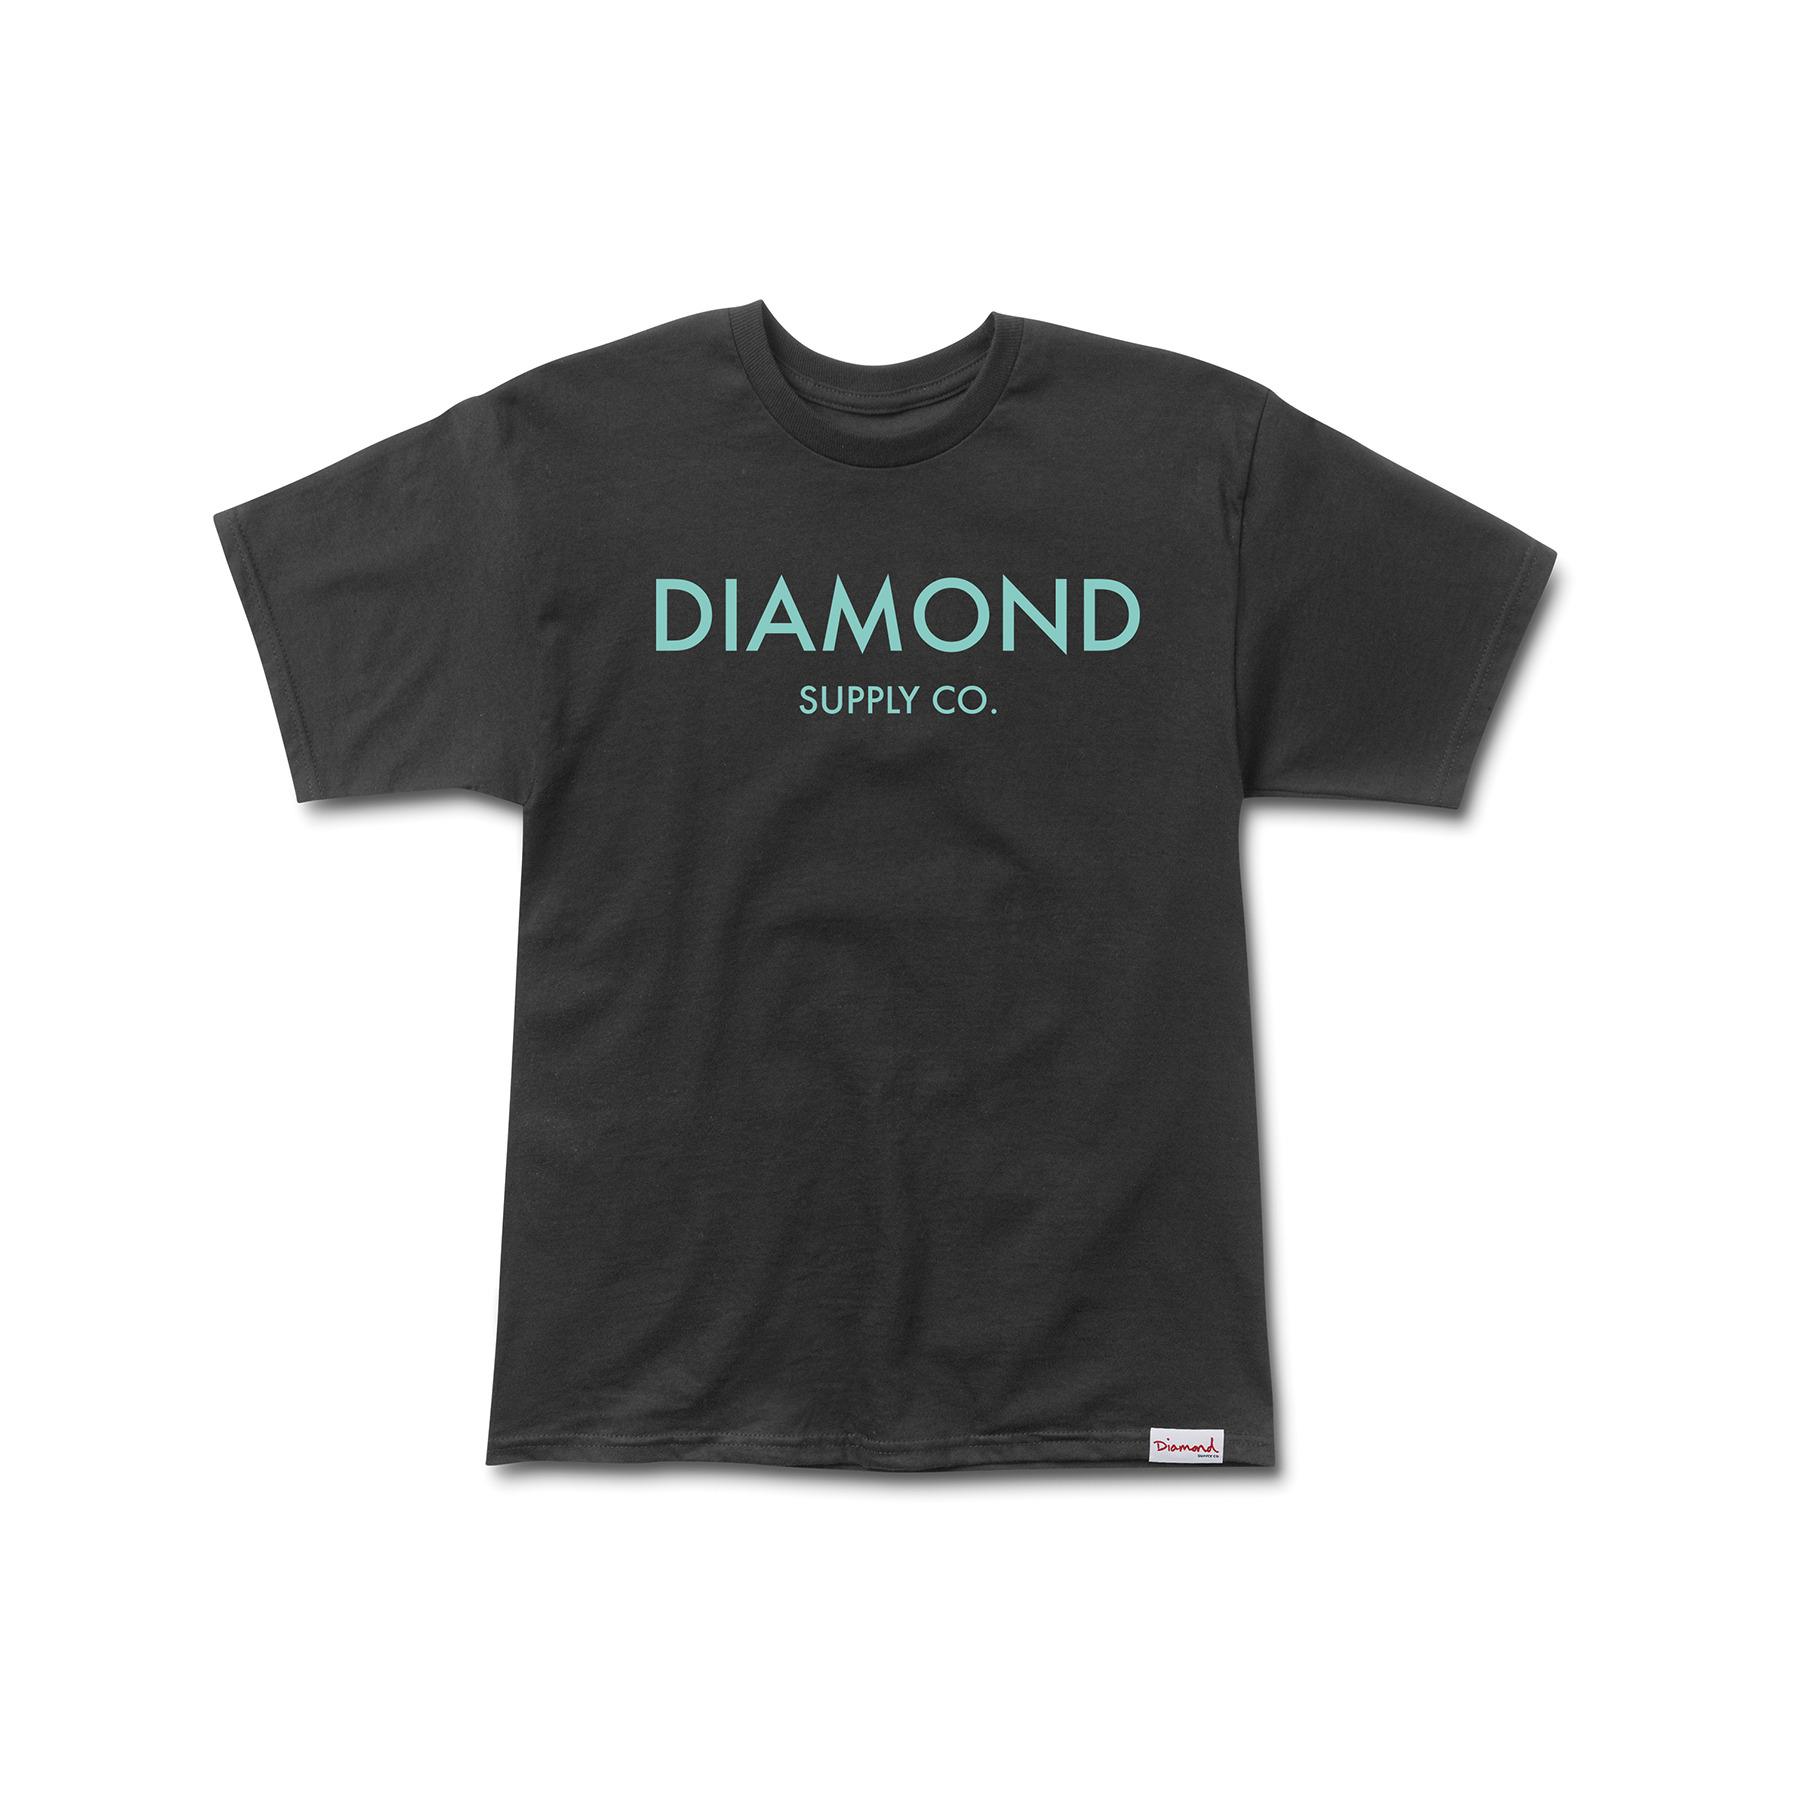 sp15_tees_0020_diamond_classic_blk.jpg